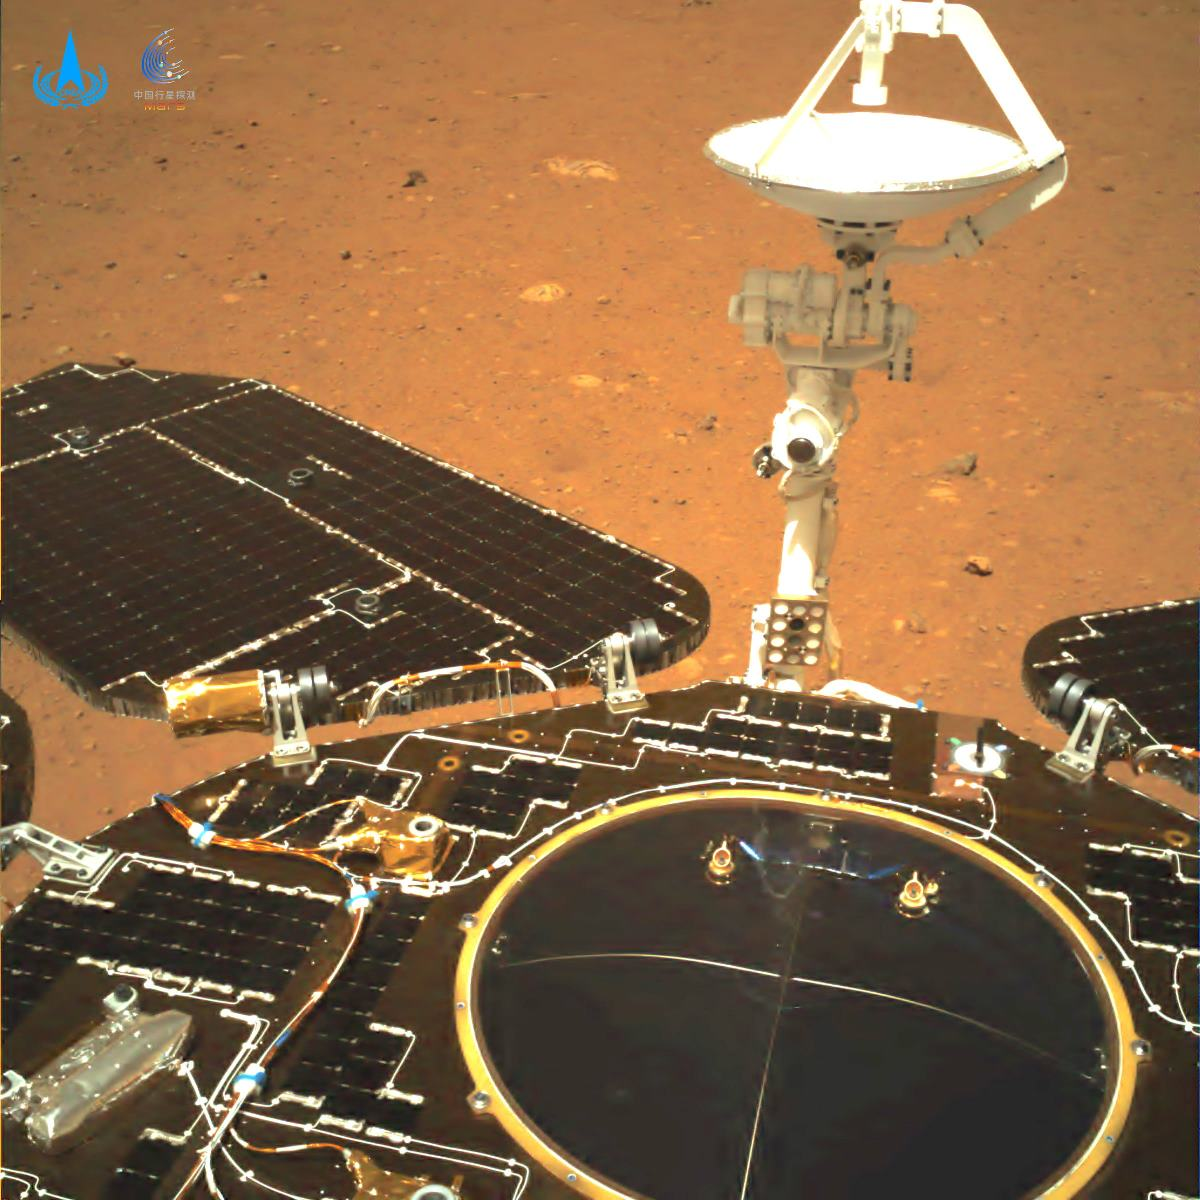 zhurong mars rover image